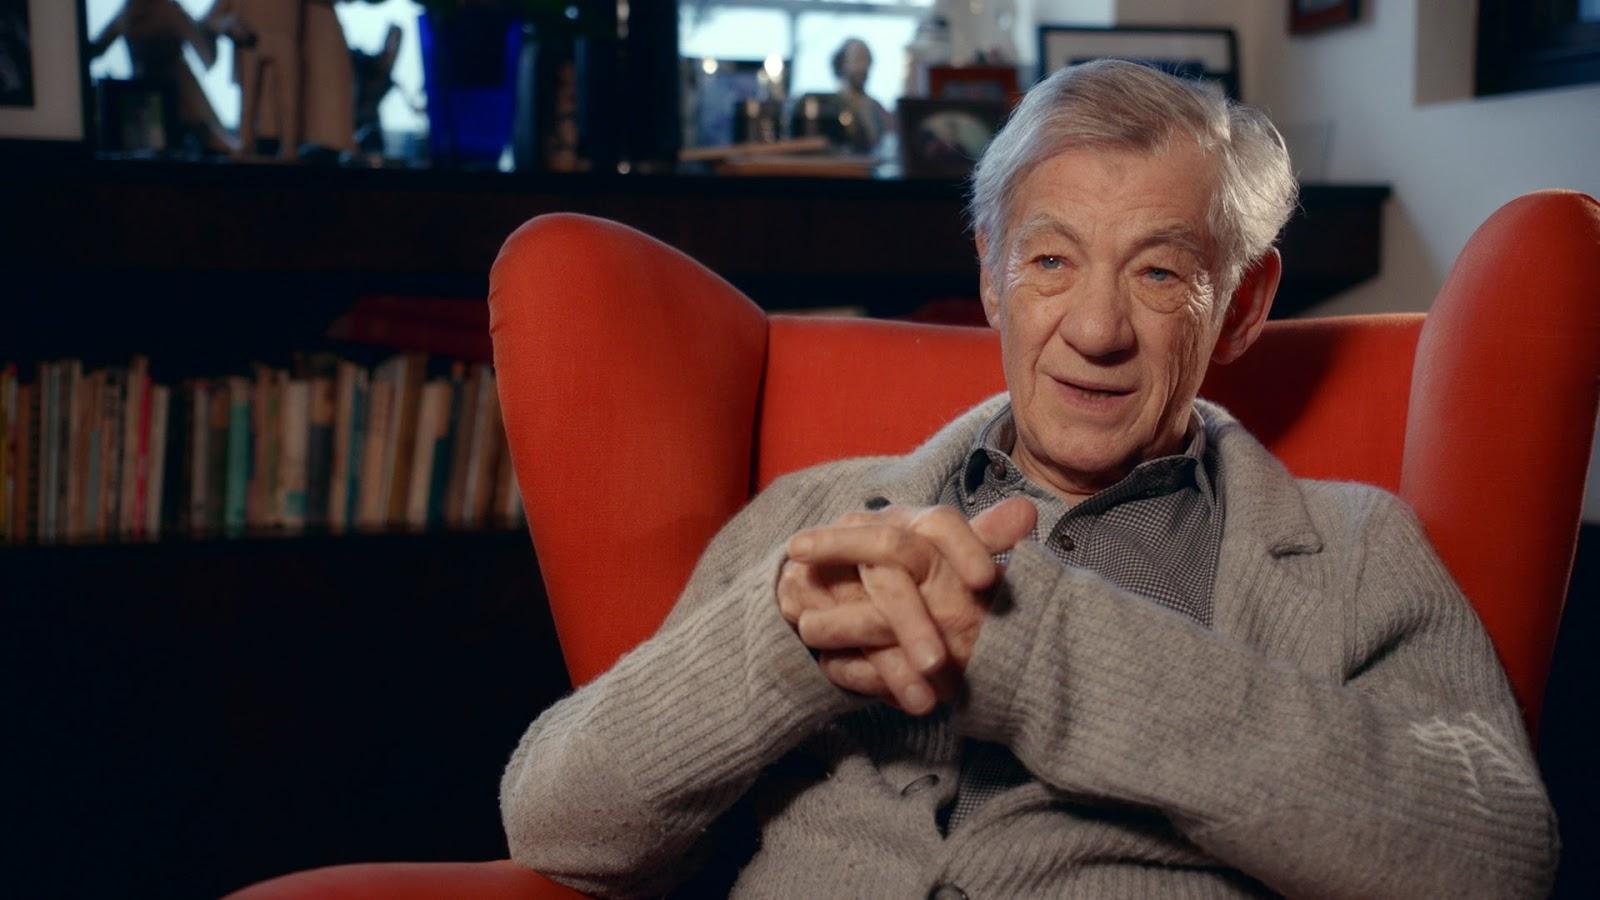 Ian McKellen diz que sofreu bullying homofóbico na juventude